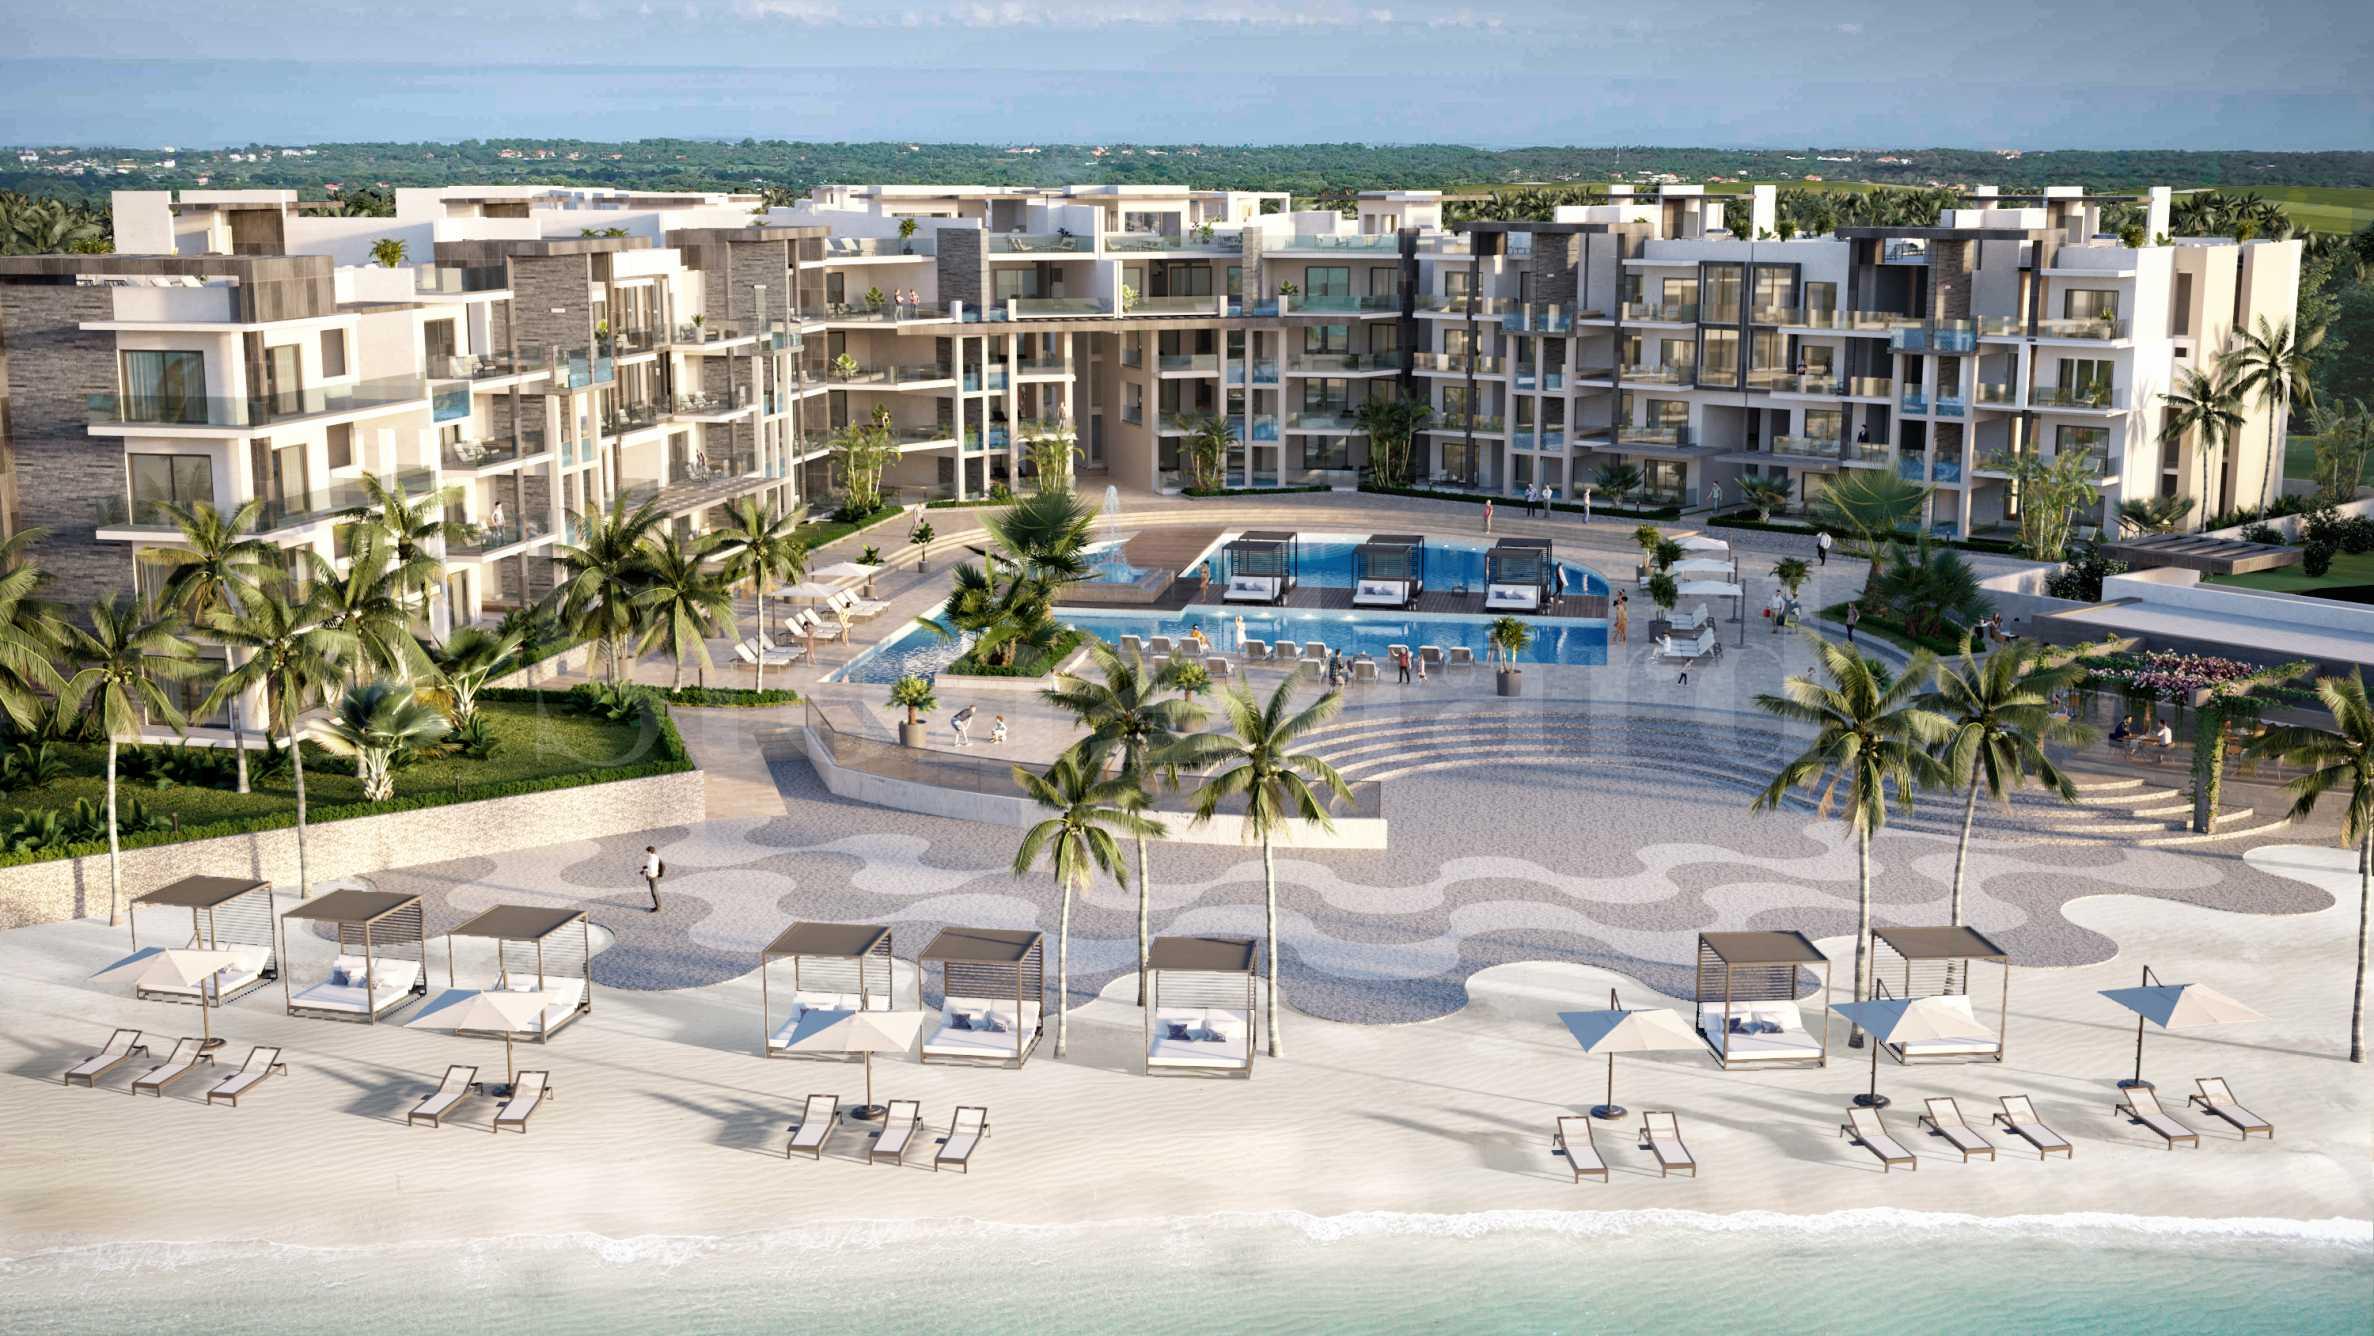 First class luxury development on the Bavaro beach, Punta Cana1 - Stonehard